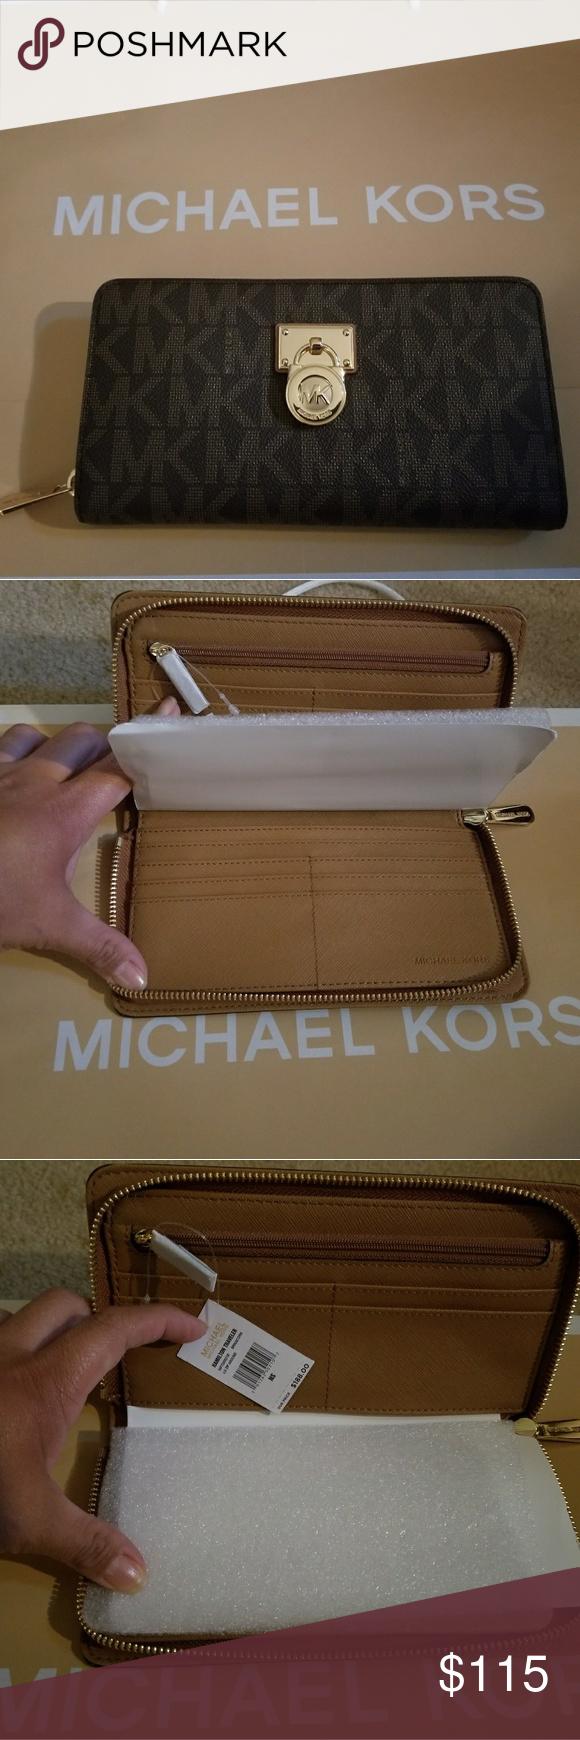 8d9adf76f7b5 NWT MK Large Traveler Wallet NEW WITH TAGS MICHAEL KORS HAMILTON LARGE  TRAVELER PURSE BROWN Michael Kors Bags Travel Bags